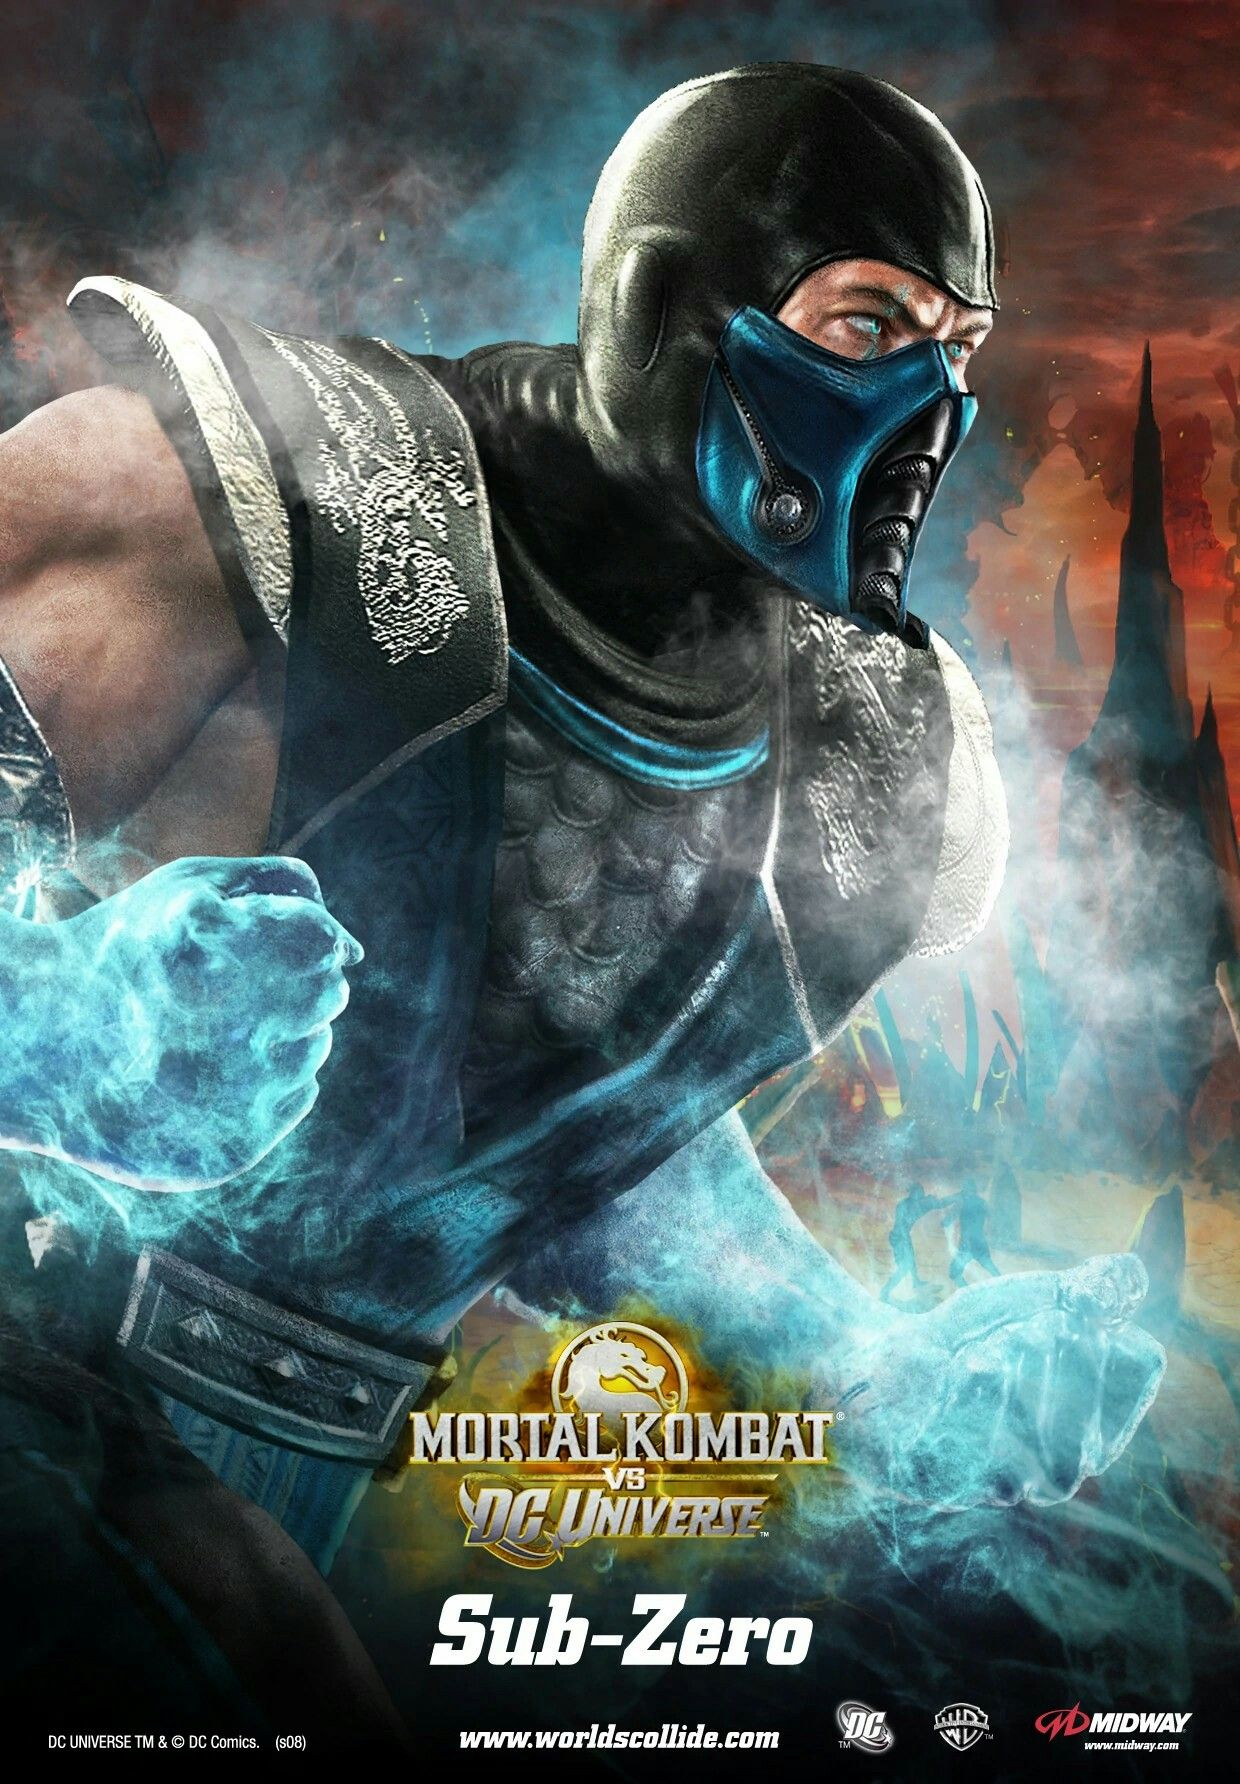 Mortal kombat vs dc universe mortalkombat dc movie